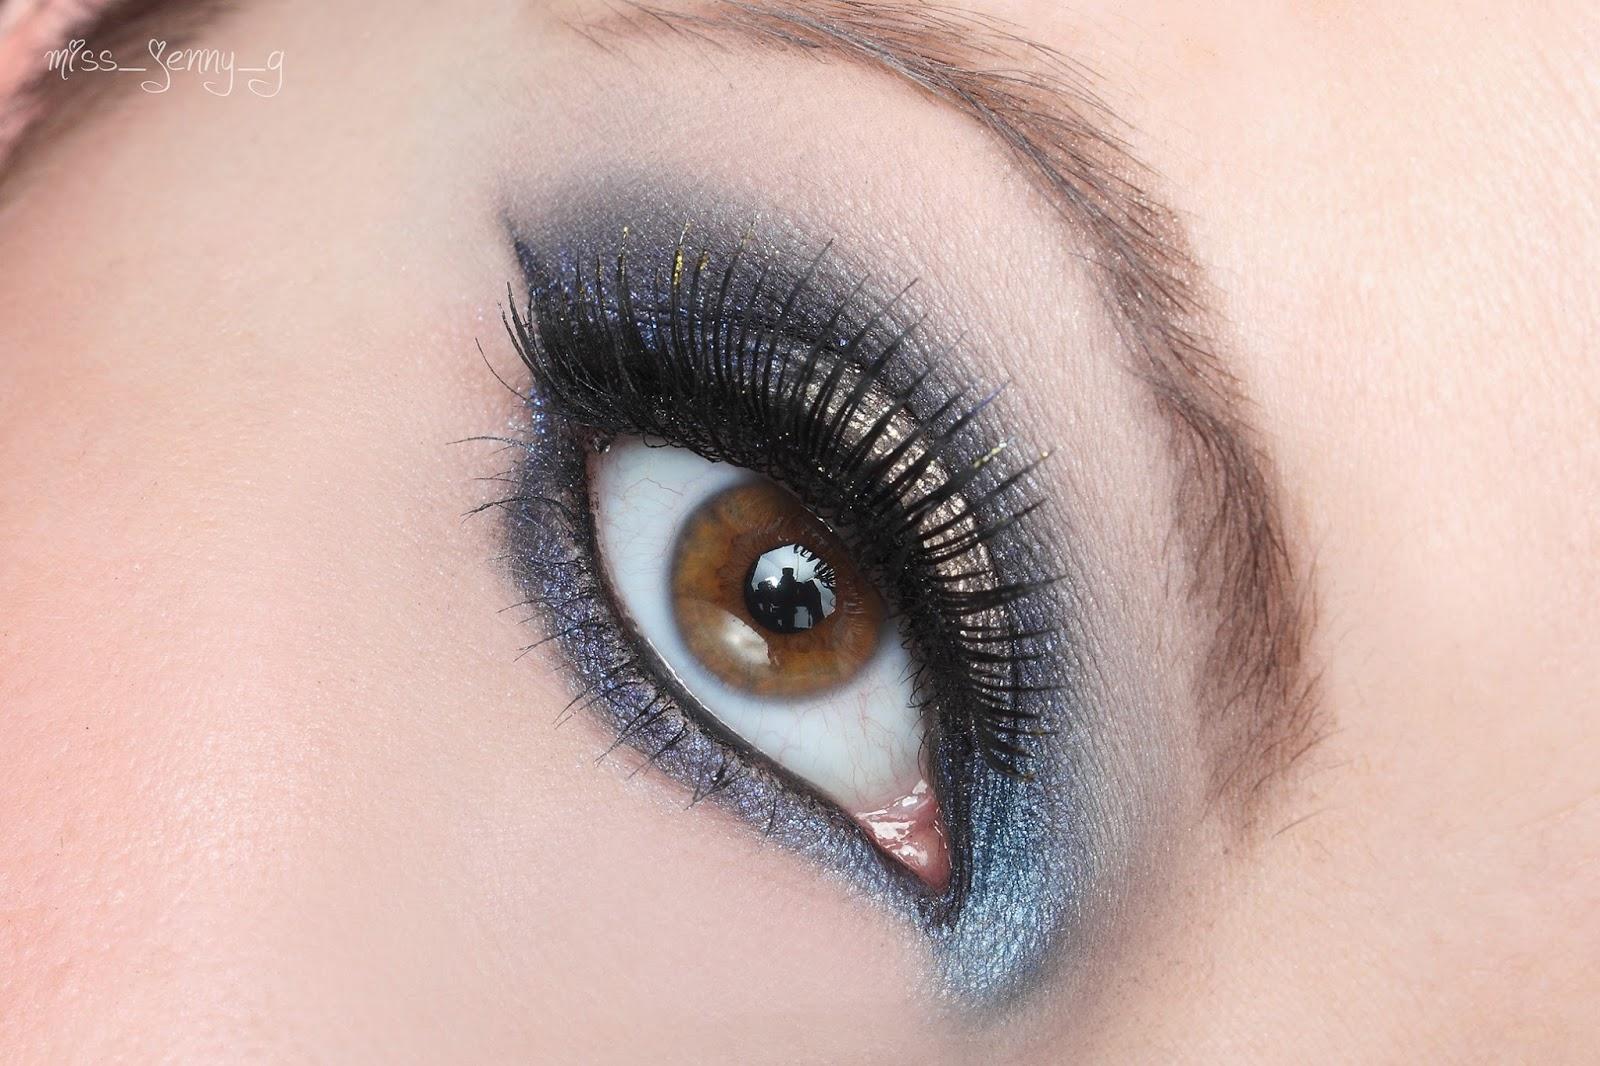 Miss jenny g beautyblog nachgeschminkt gold blue - Smokey eyes blau ...